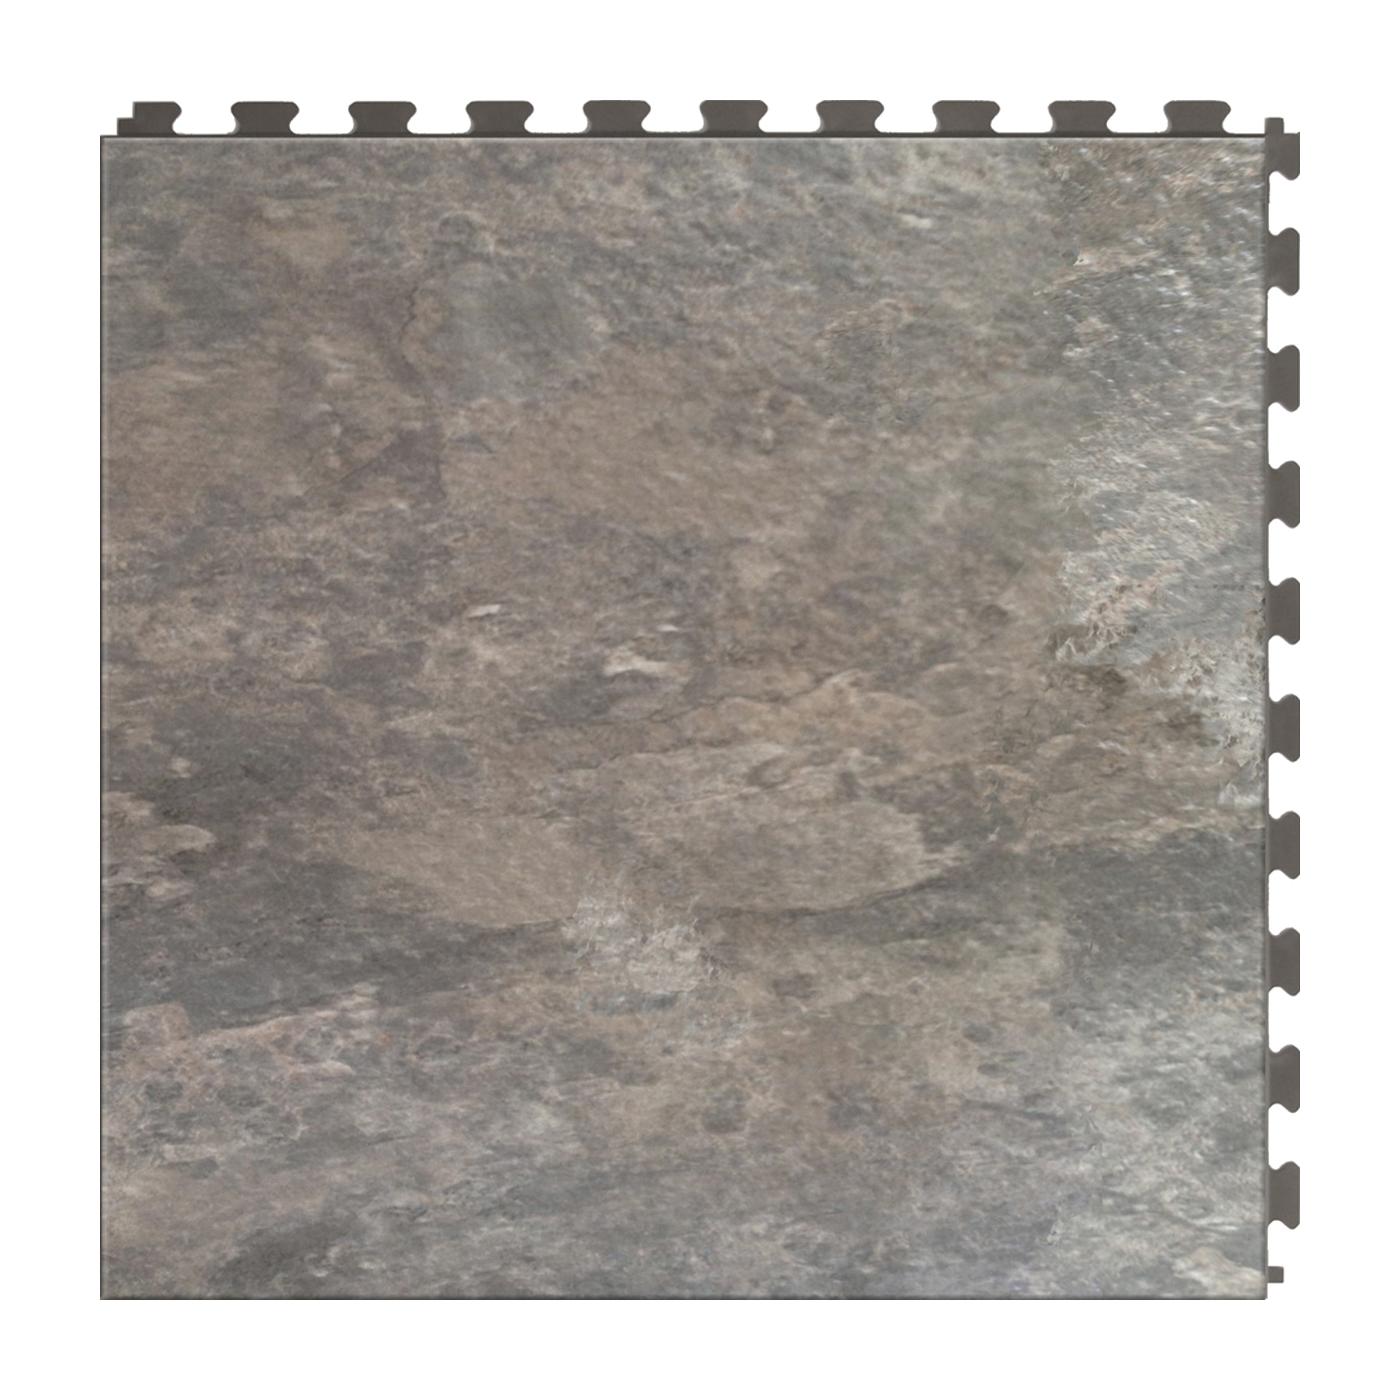 Picture of PERFECTION FLOOR TILE ITNS570AS50 Floor Tile, 20 in L Tile, 20 in W Tile, Granite Pattern, Atlantic Slate